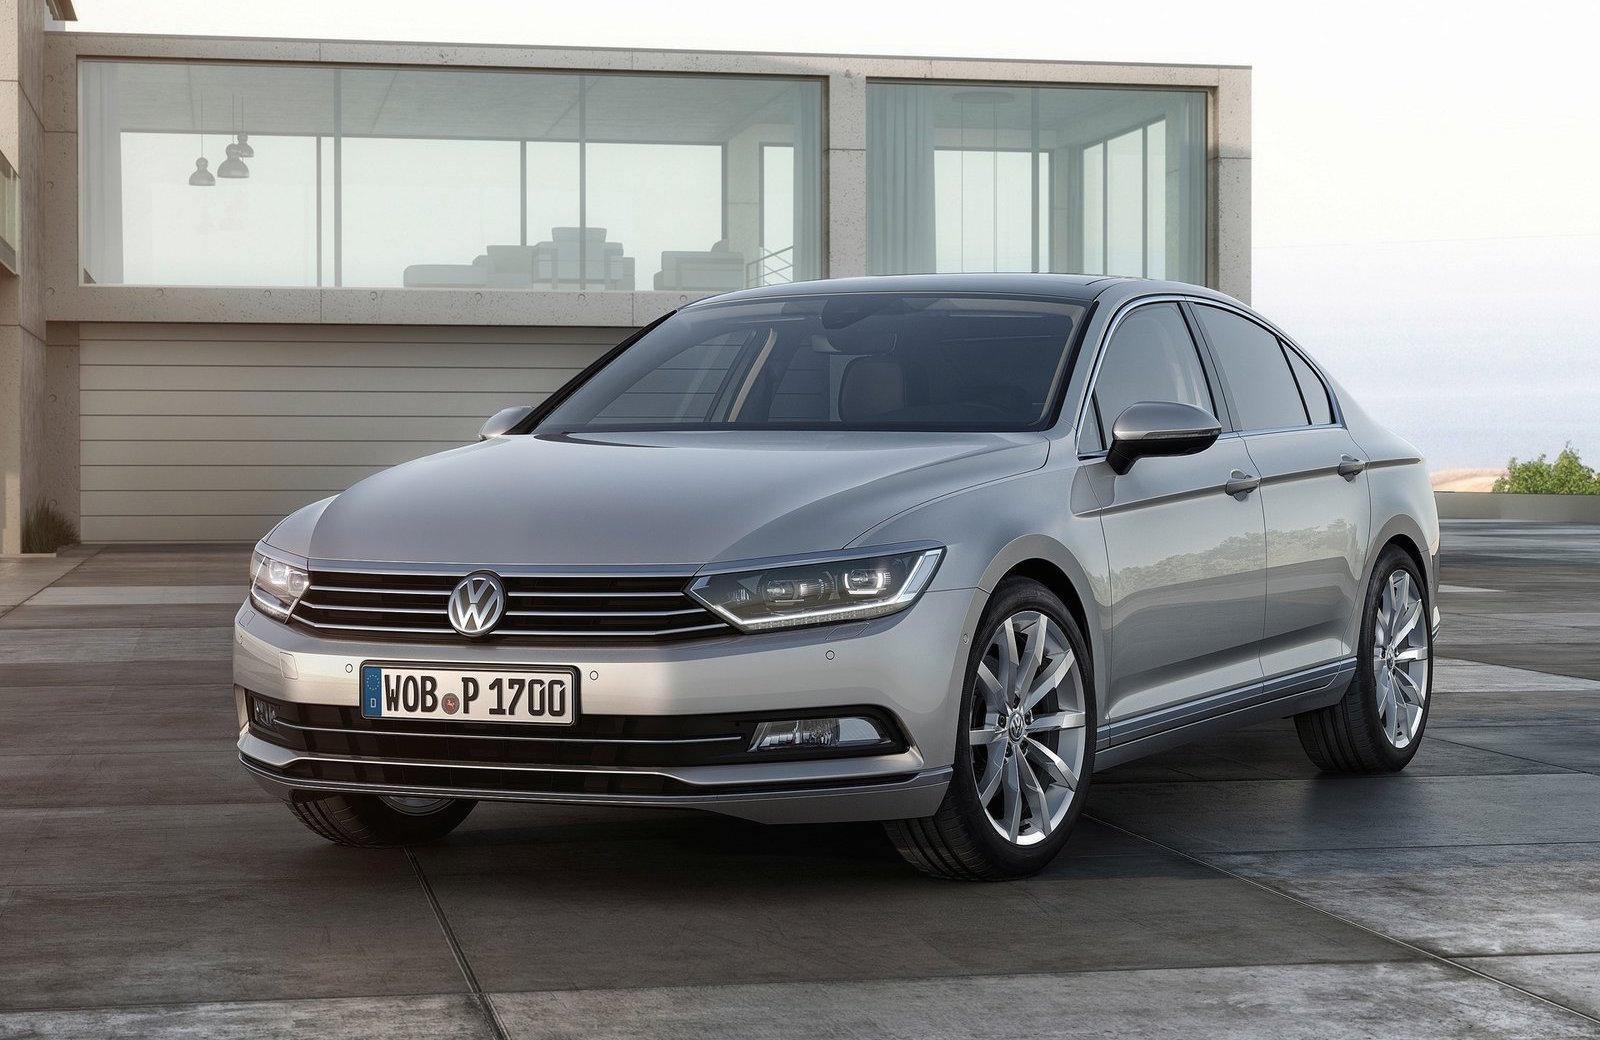 Volkswagen Passat production halts continue, demand dwindling